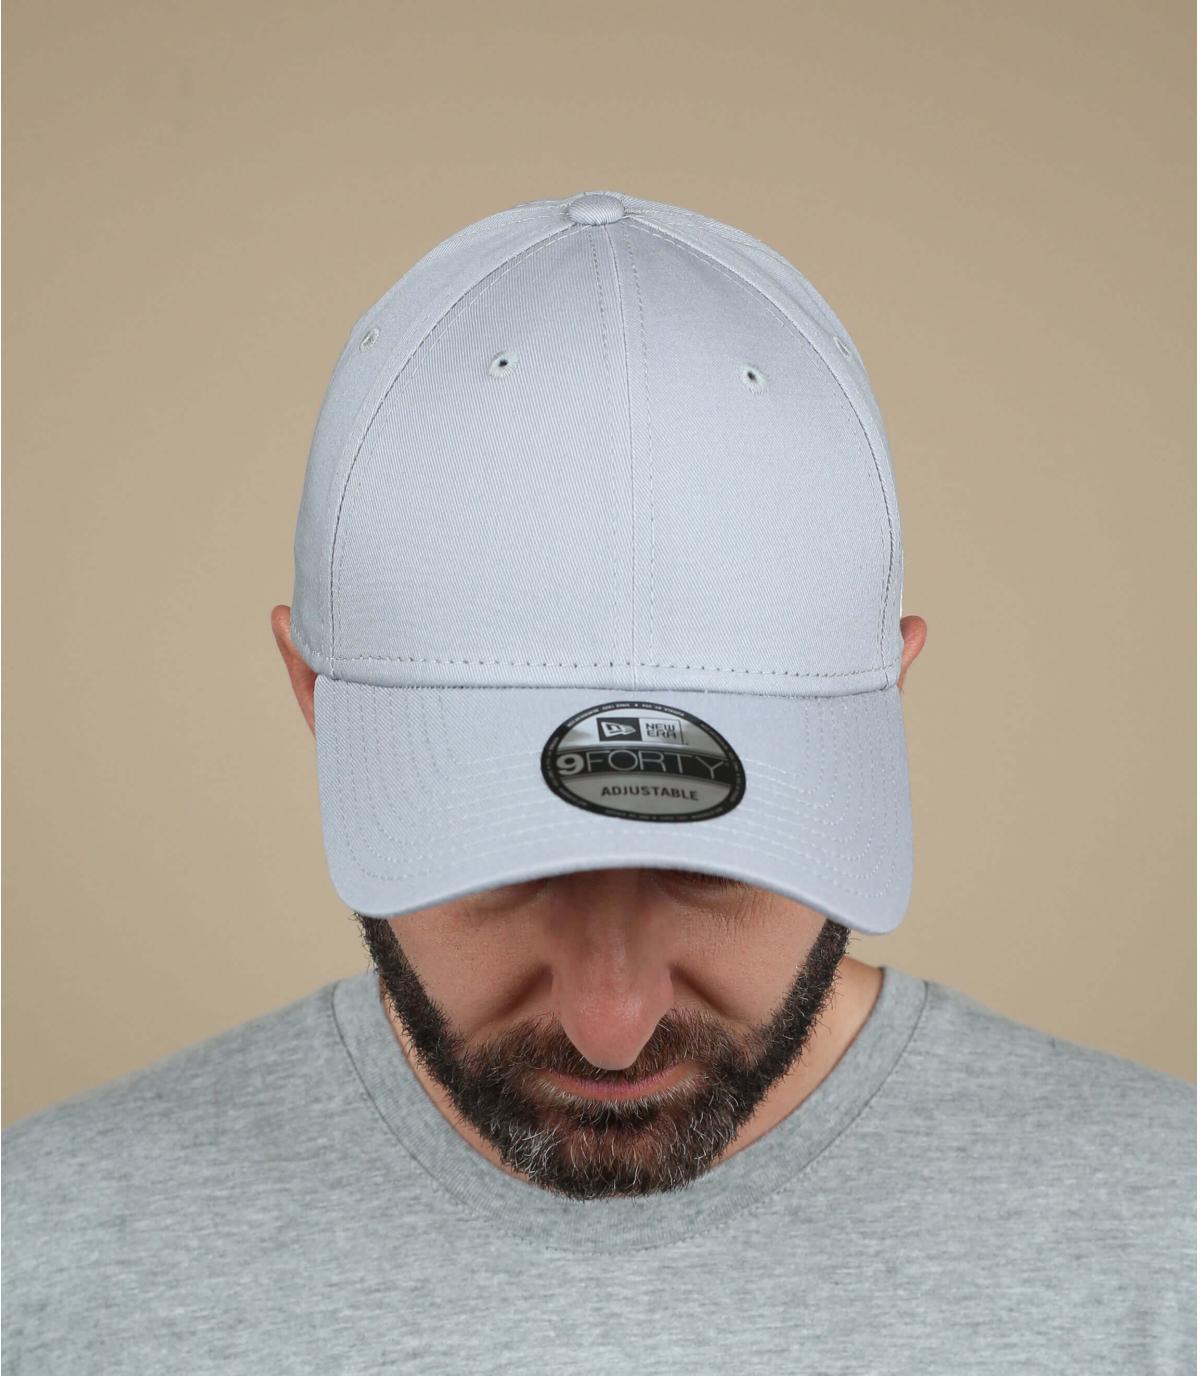 Grau curved visor cap